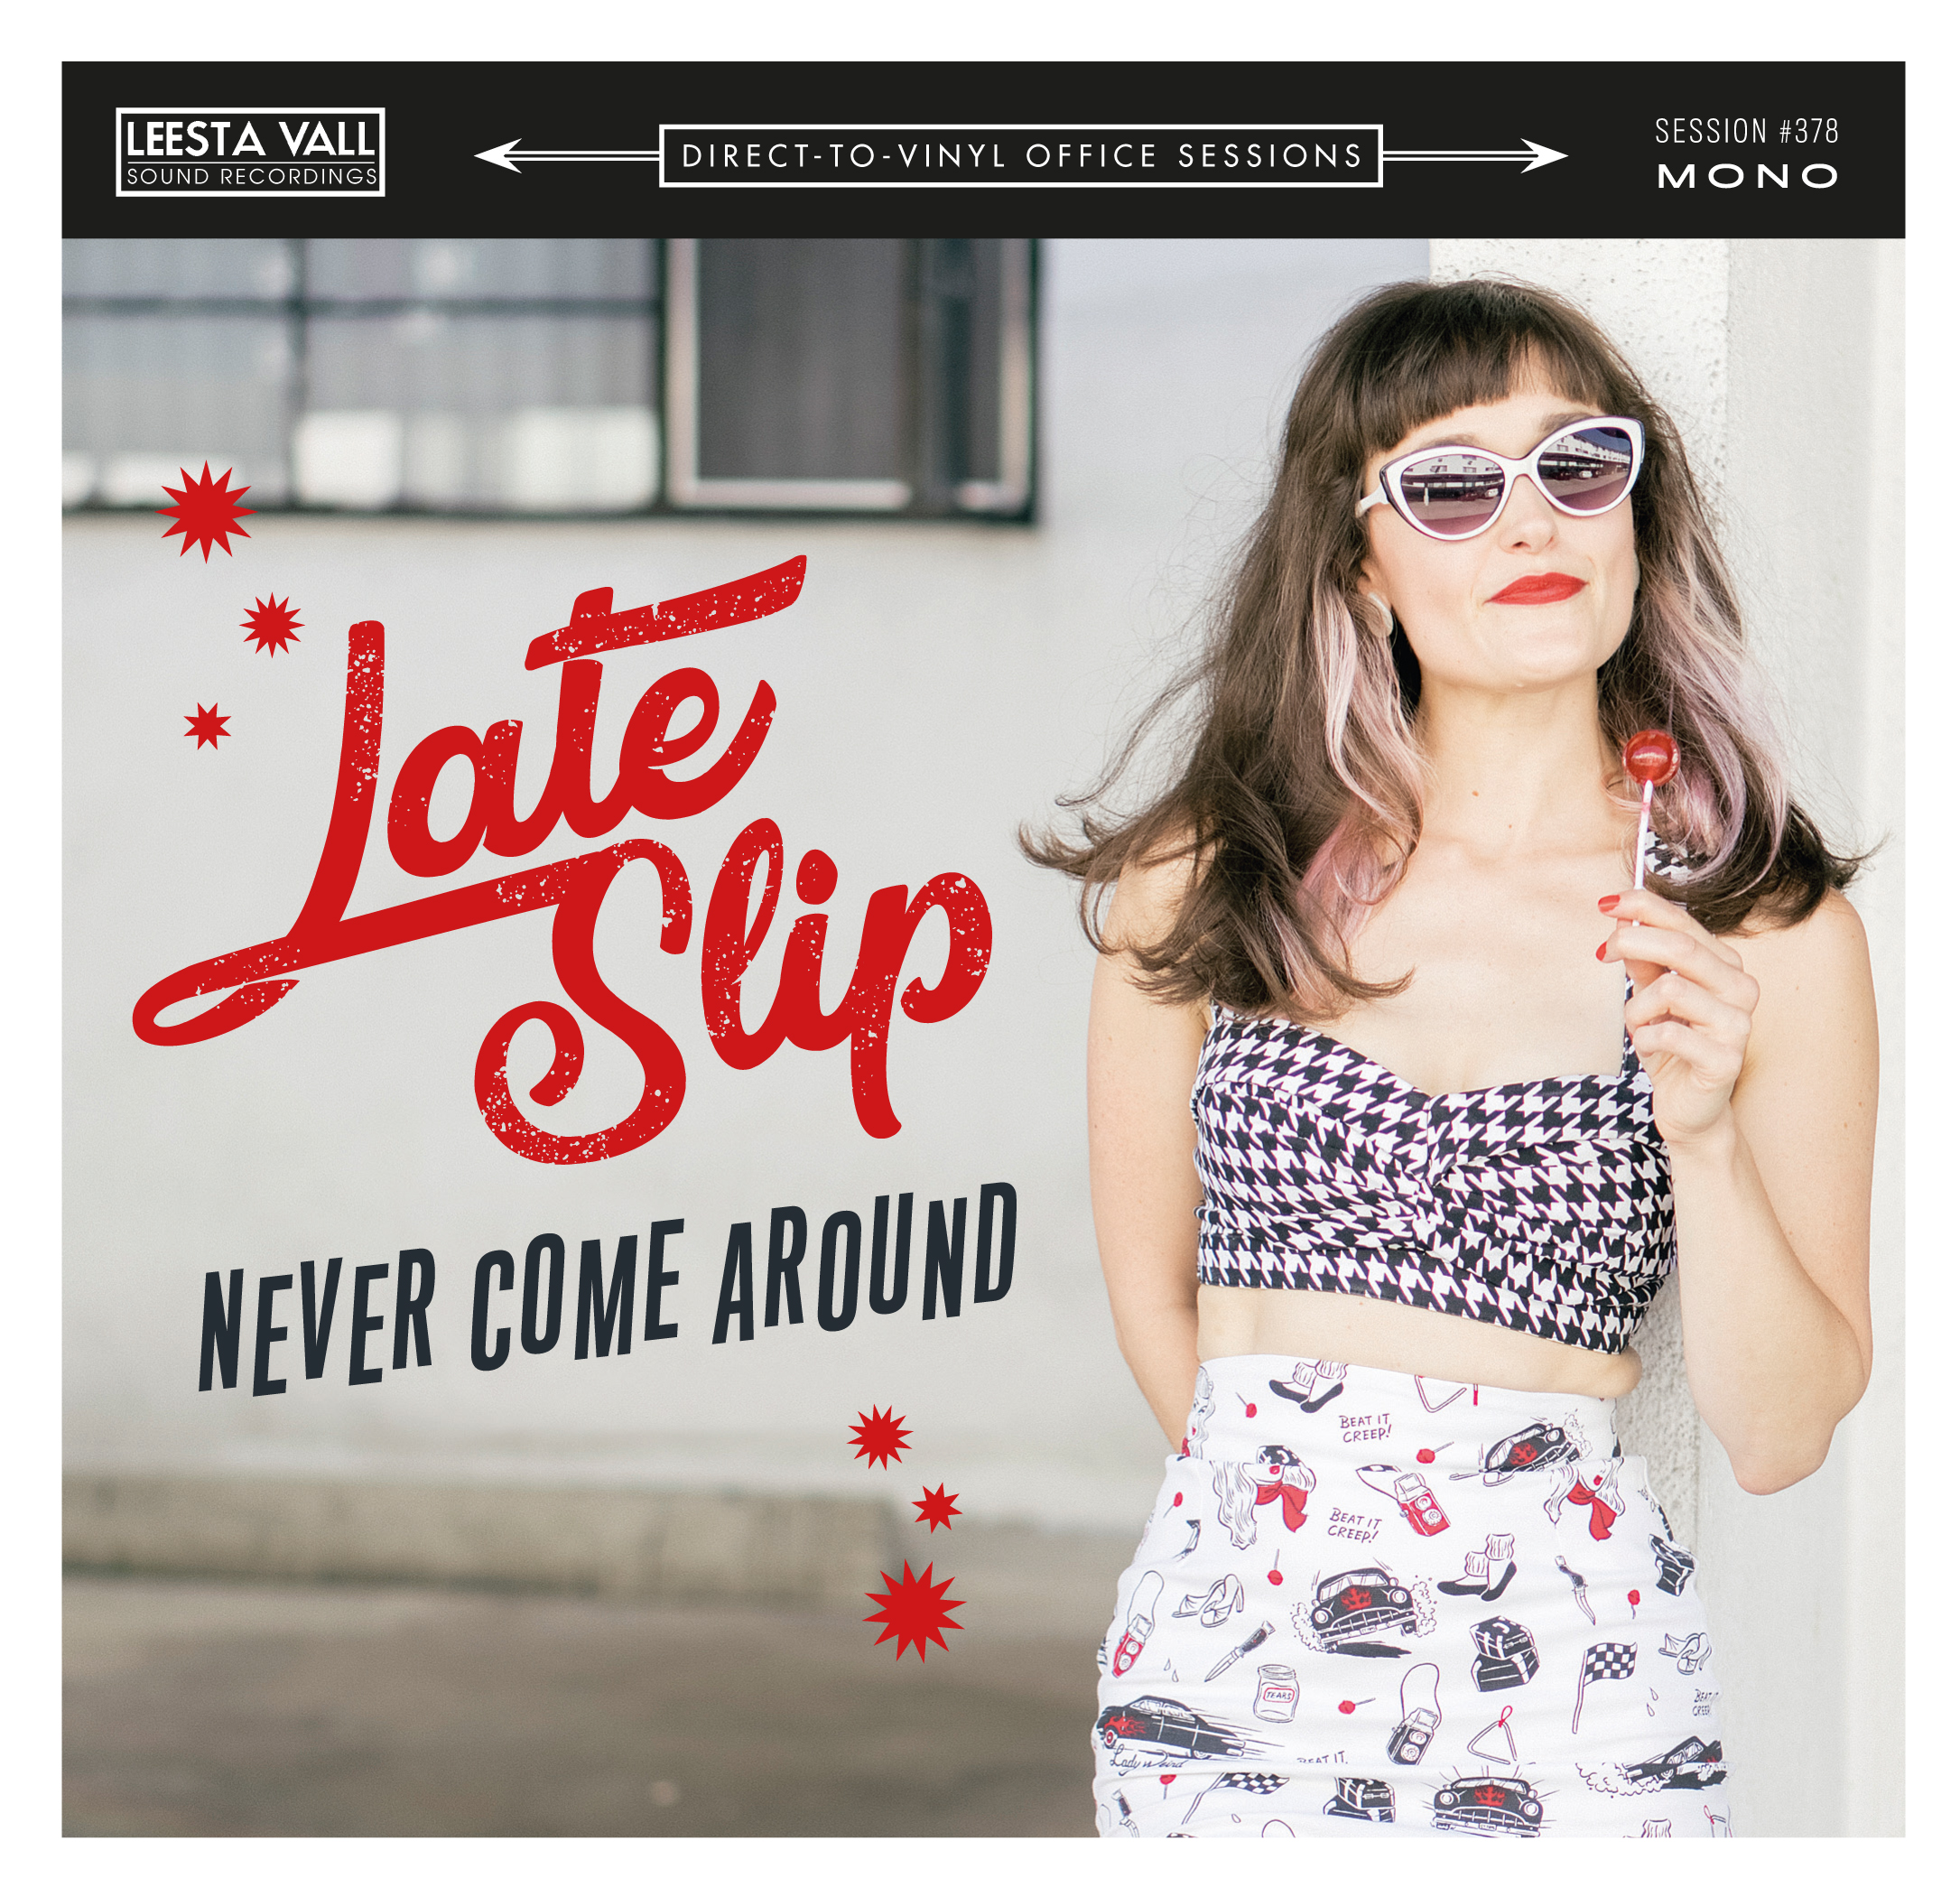 Late Slip Leesta Vall Cover Never Come Around.jpg